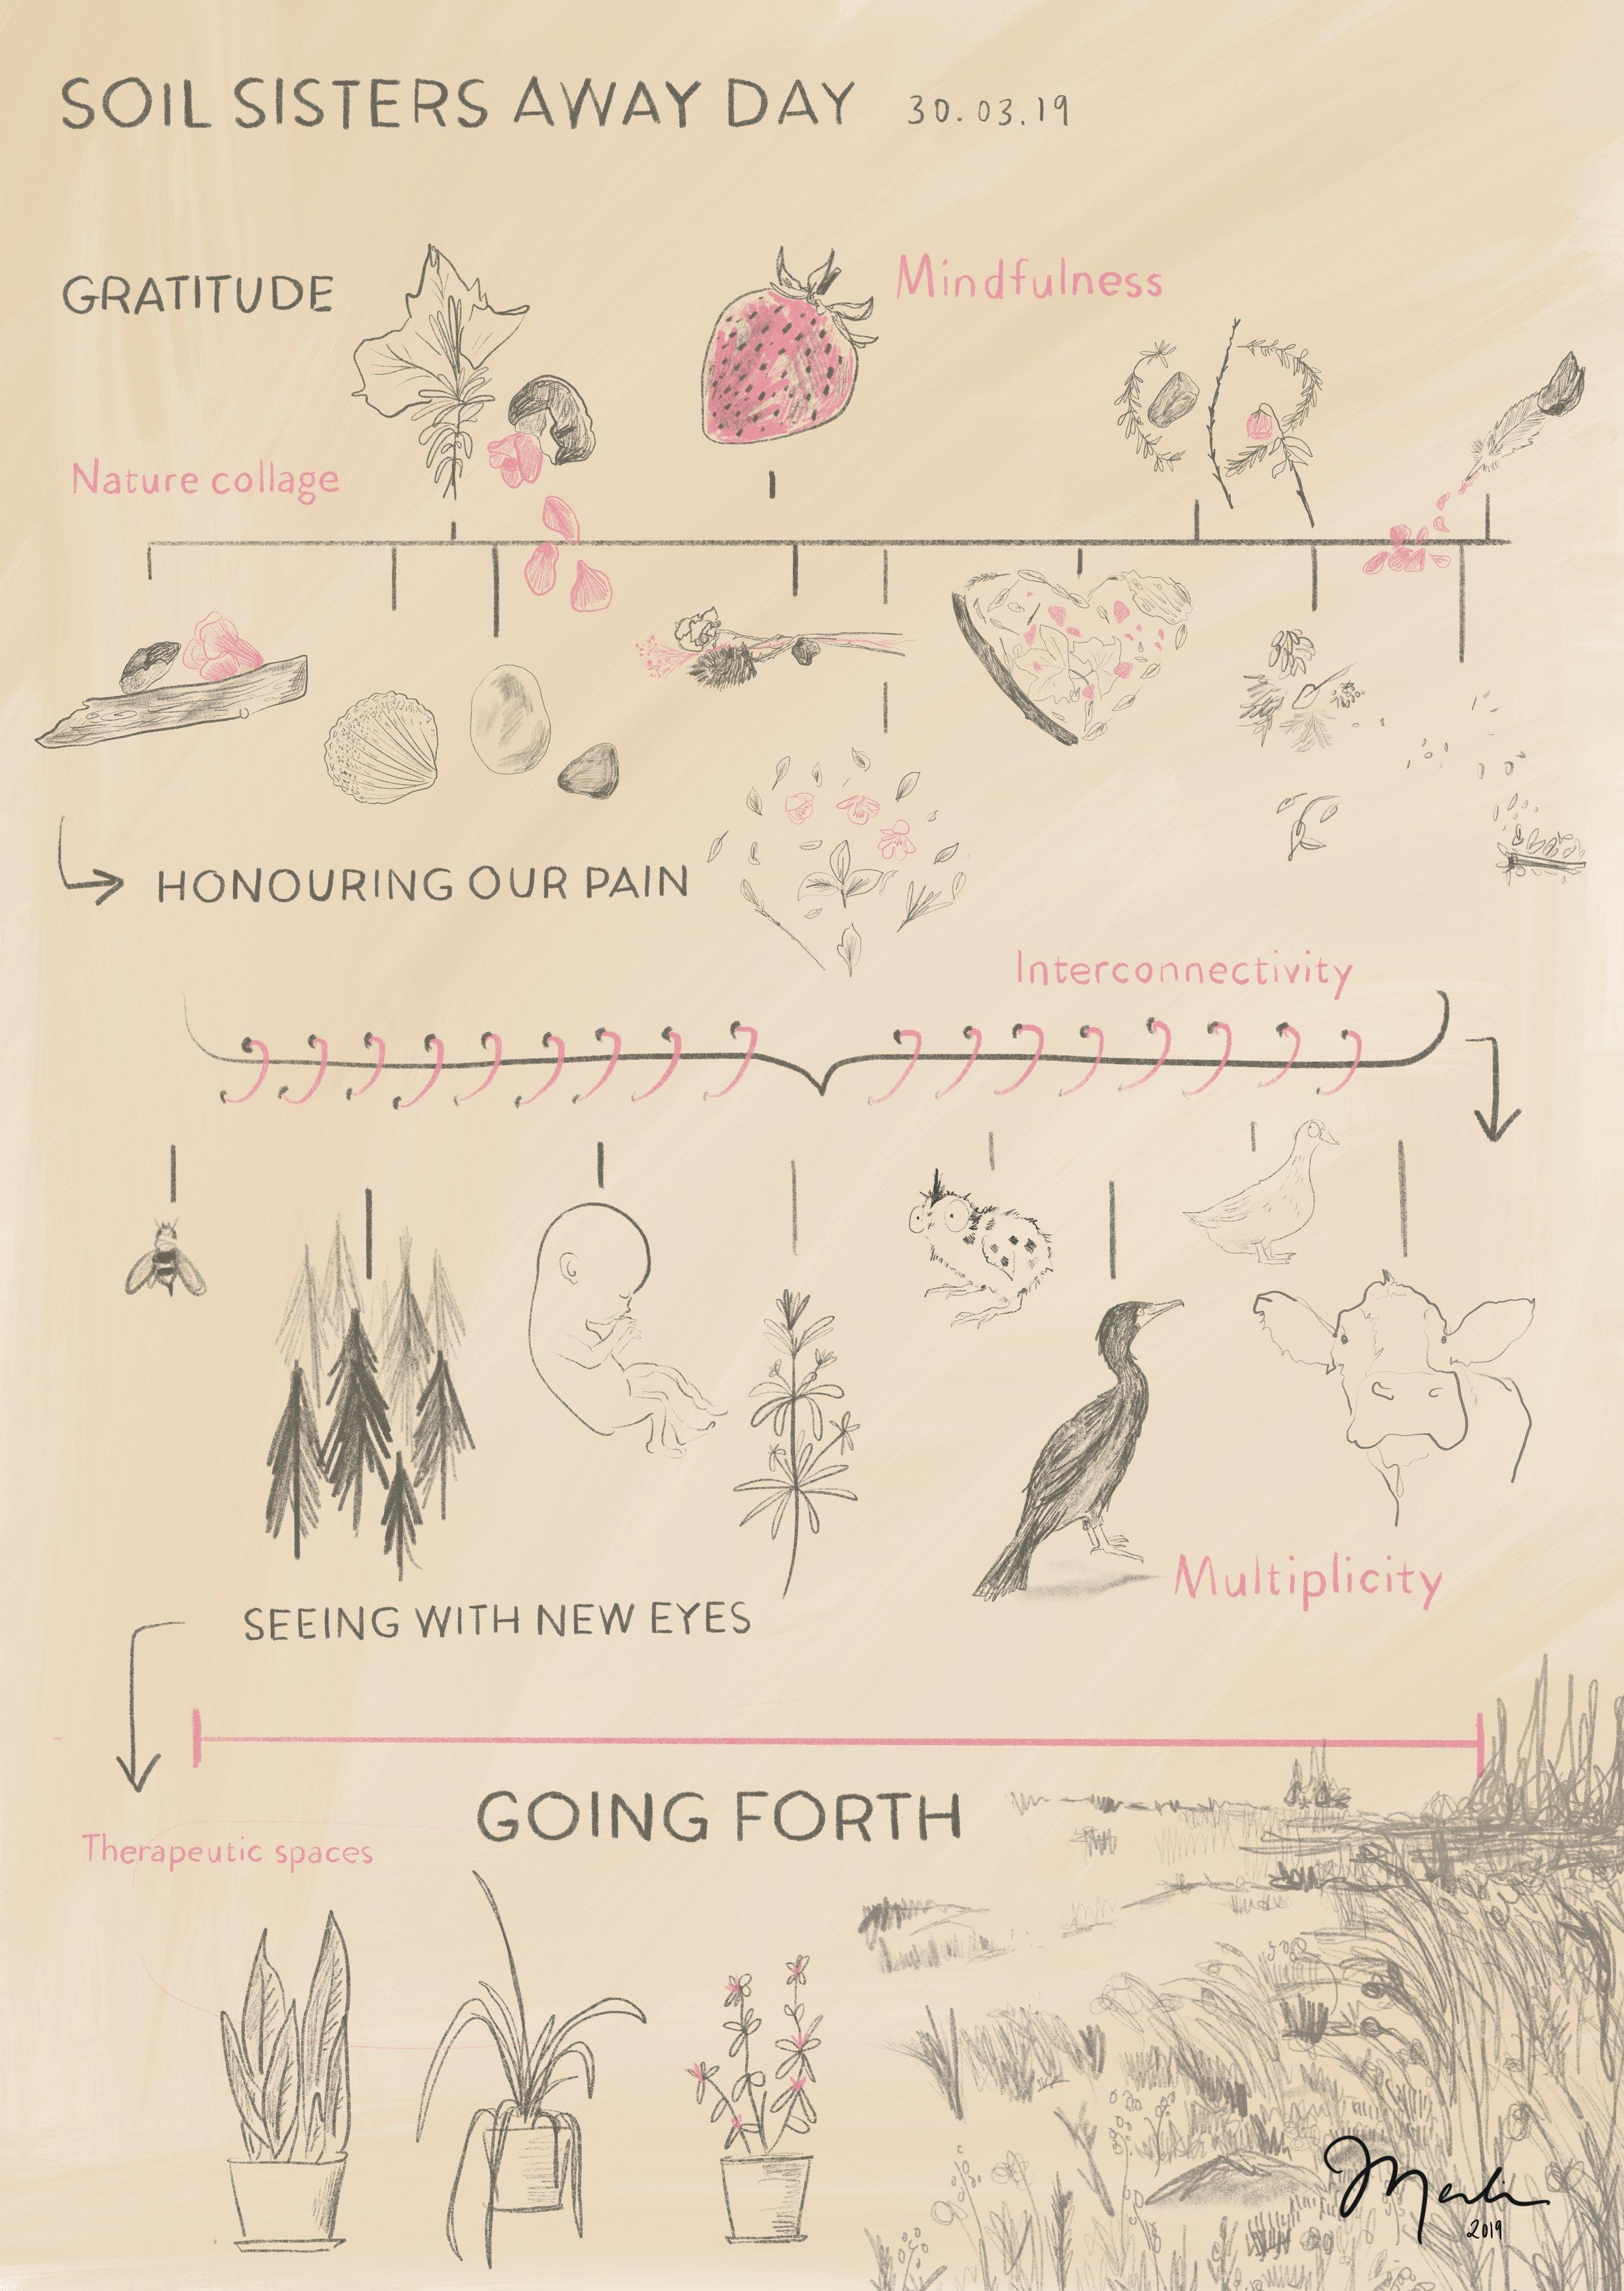 Soil Sisters Away Day by  Merlin Strangeway